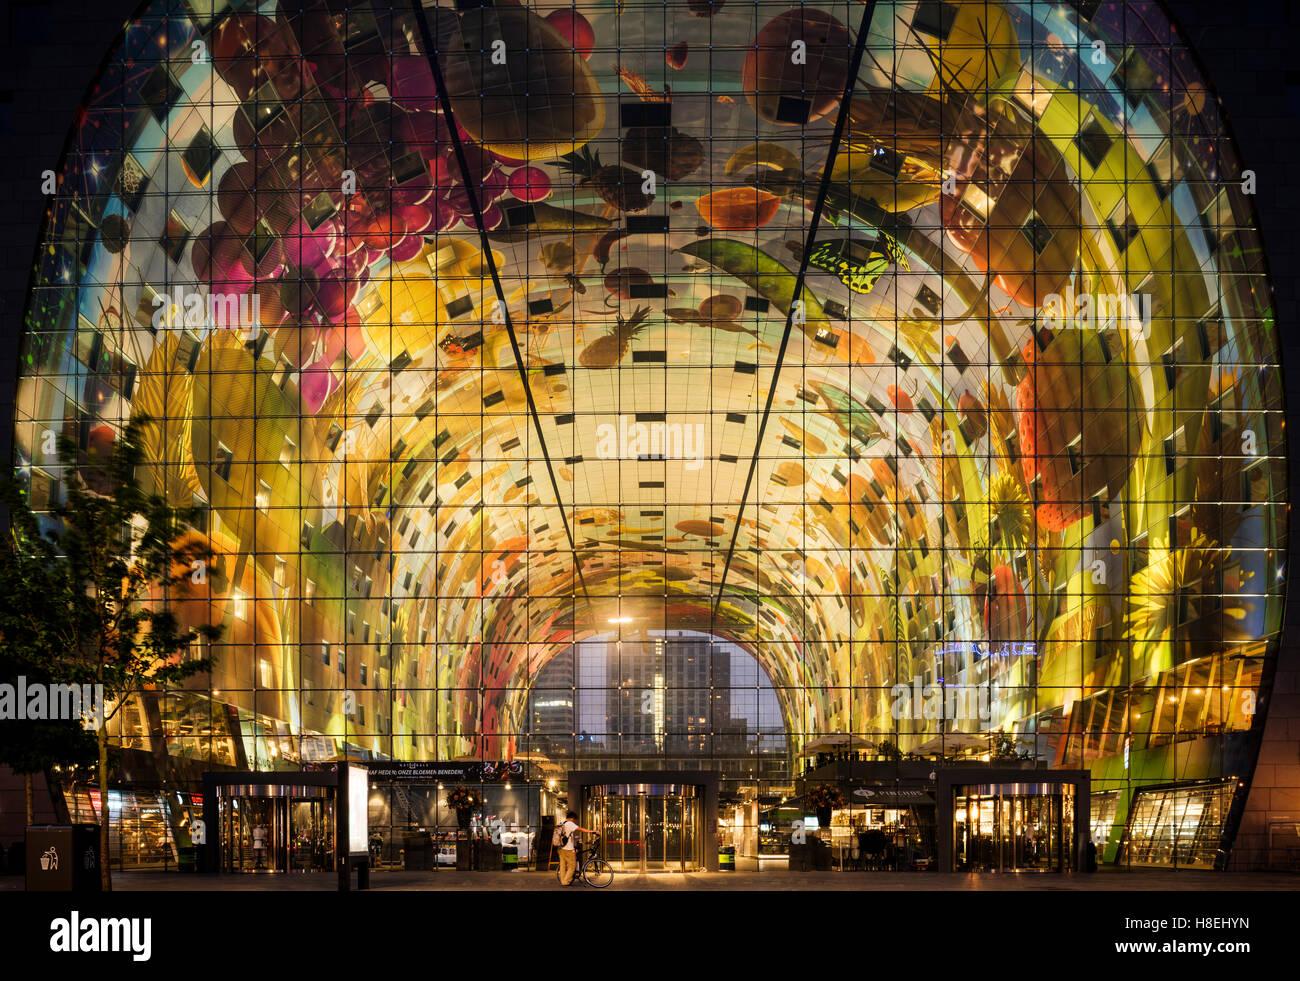 Exterior de Markthal, Westnieuwland, Rotterdam, Países Bajos, Europa Imagen De Stock